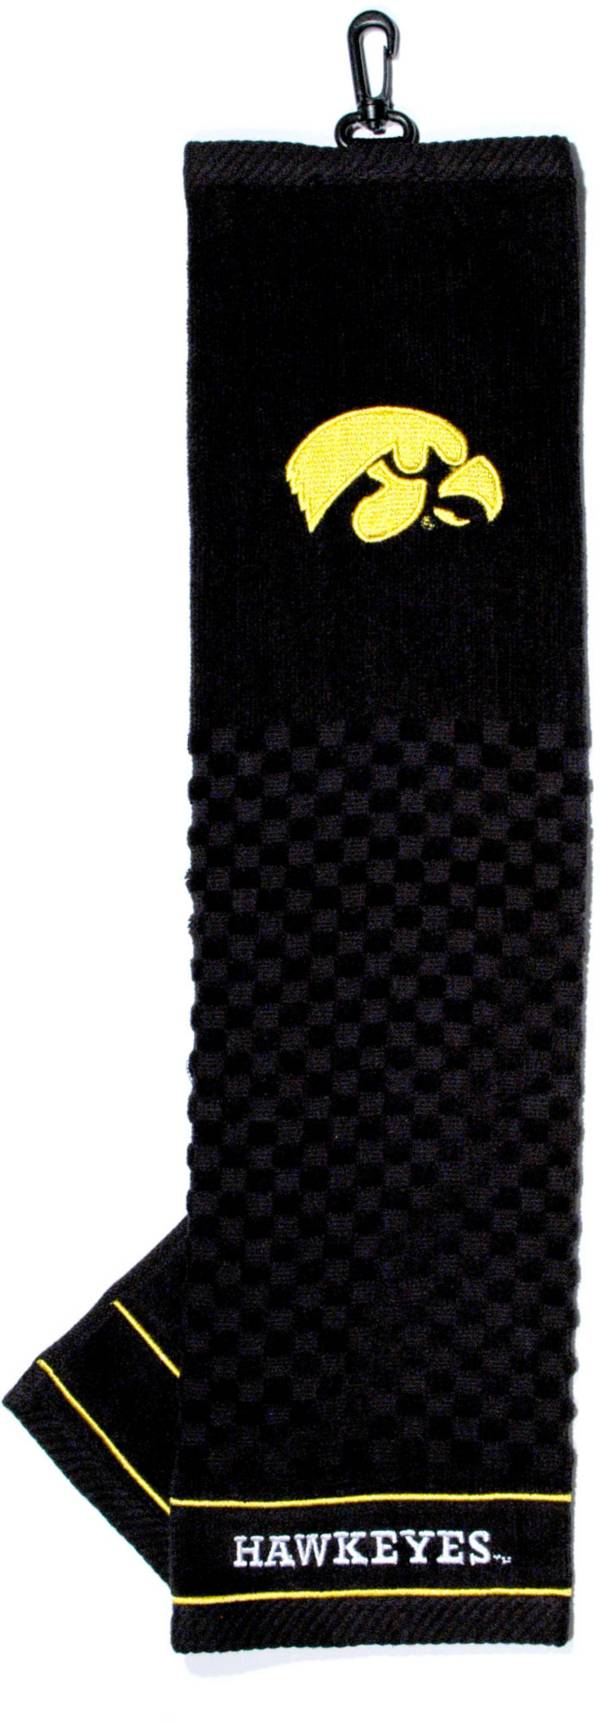 Team Golf Iowa Hawkeyes Woven Towel product image